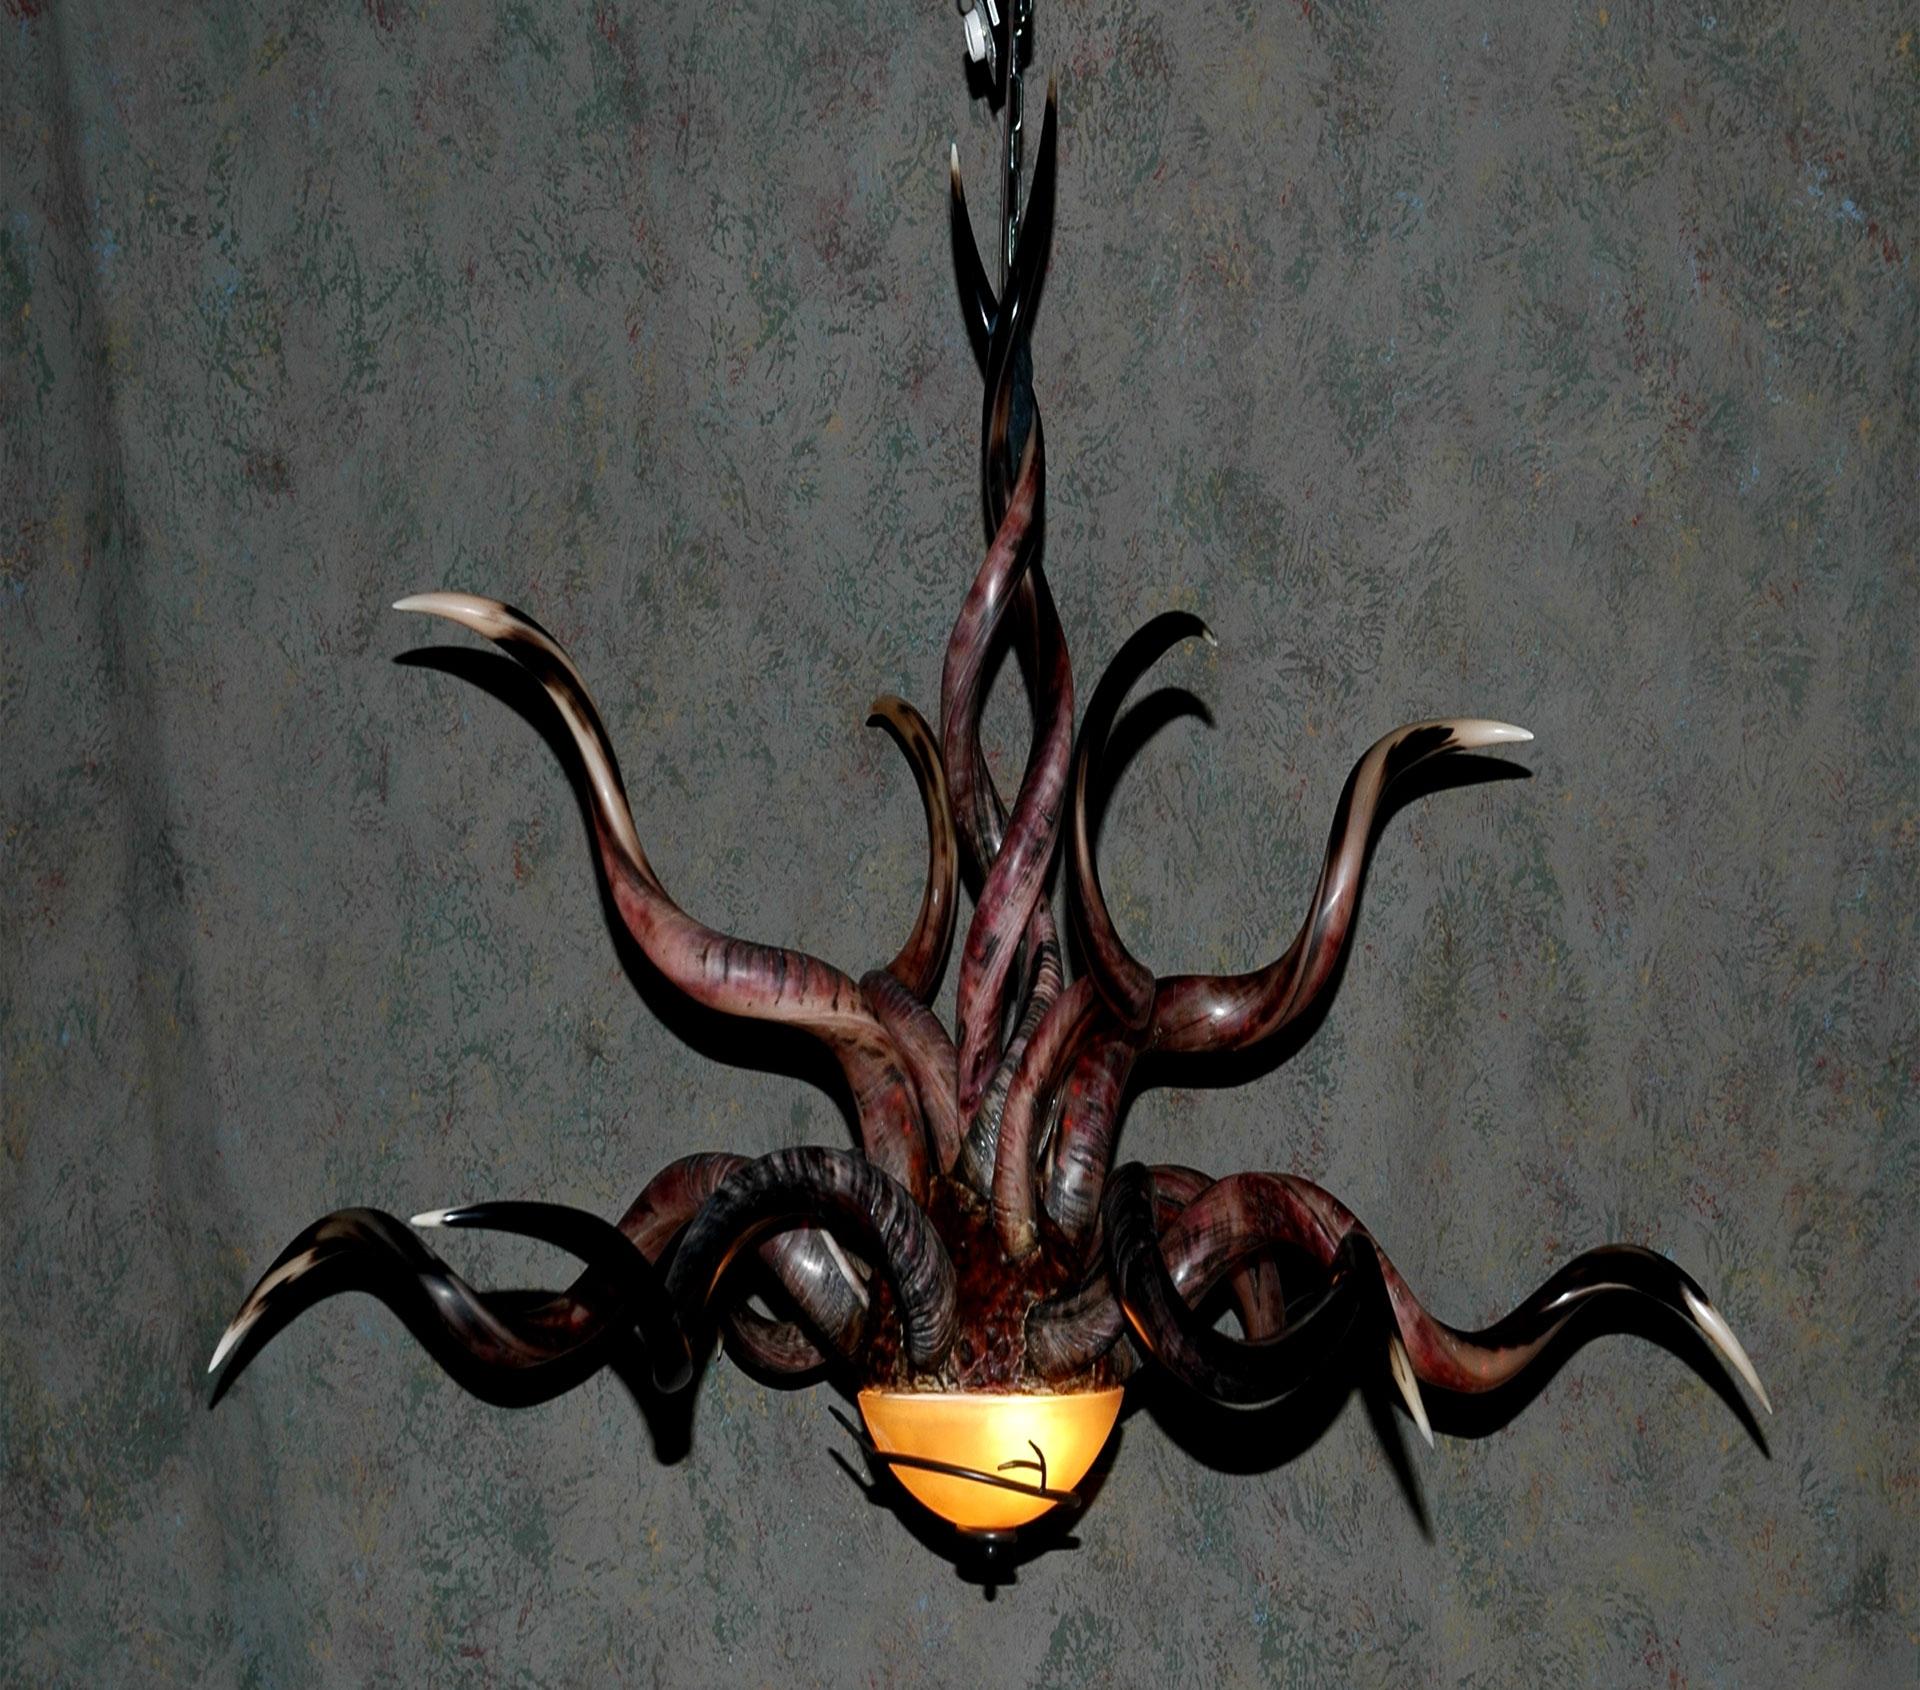 Widely Used Antler Chandeliers, Deer Antler Chandelier, Deer Antler Lamps Intended For Large Antler Chandelier (View 20 of 20)